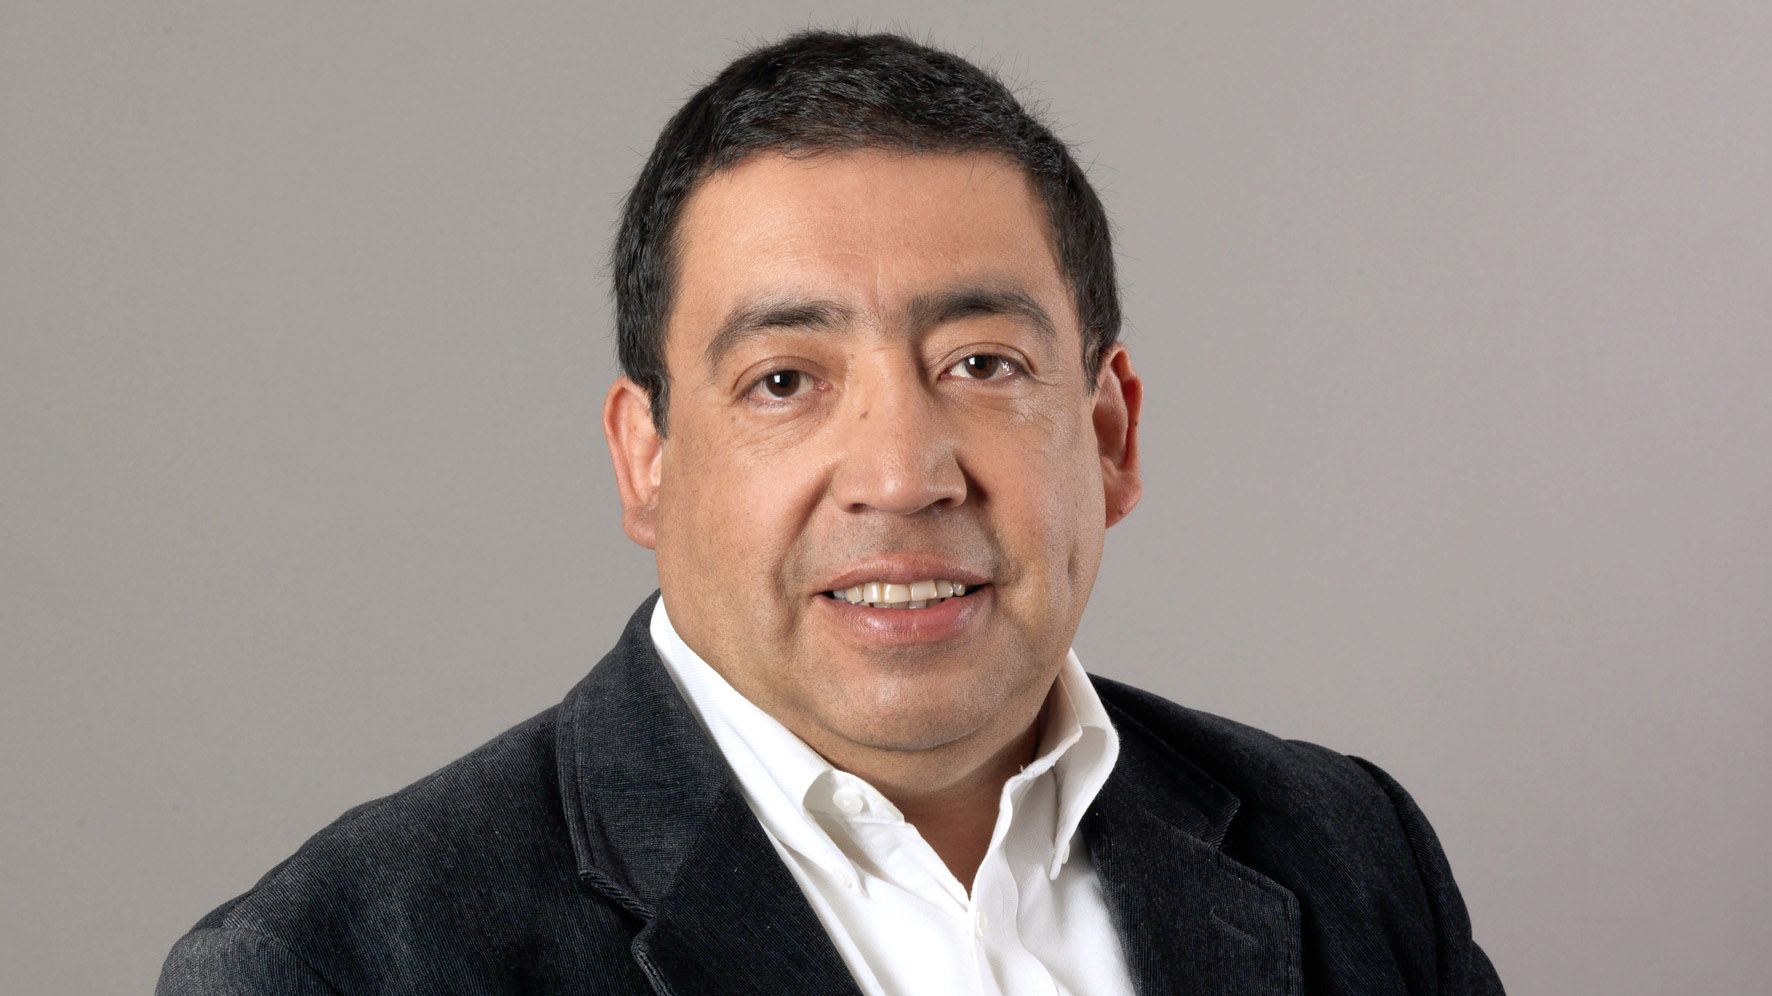 Profesor FEN UCHILE José Olivares